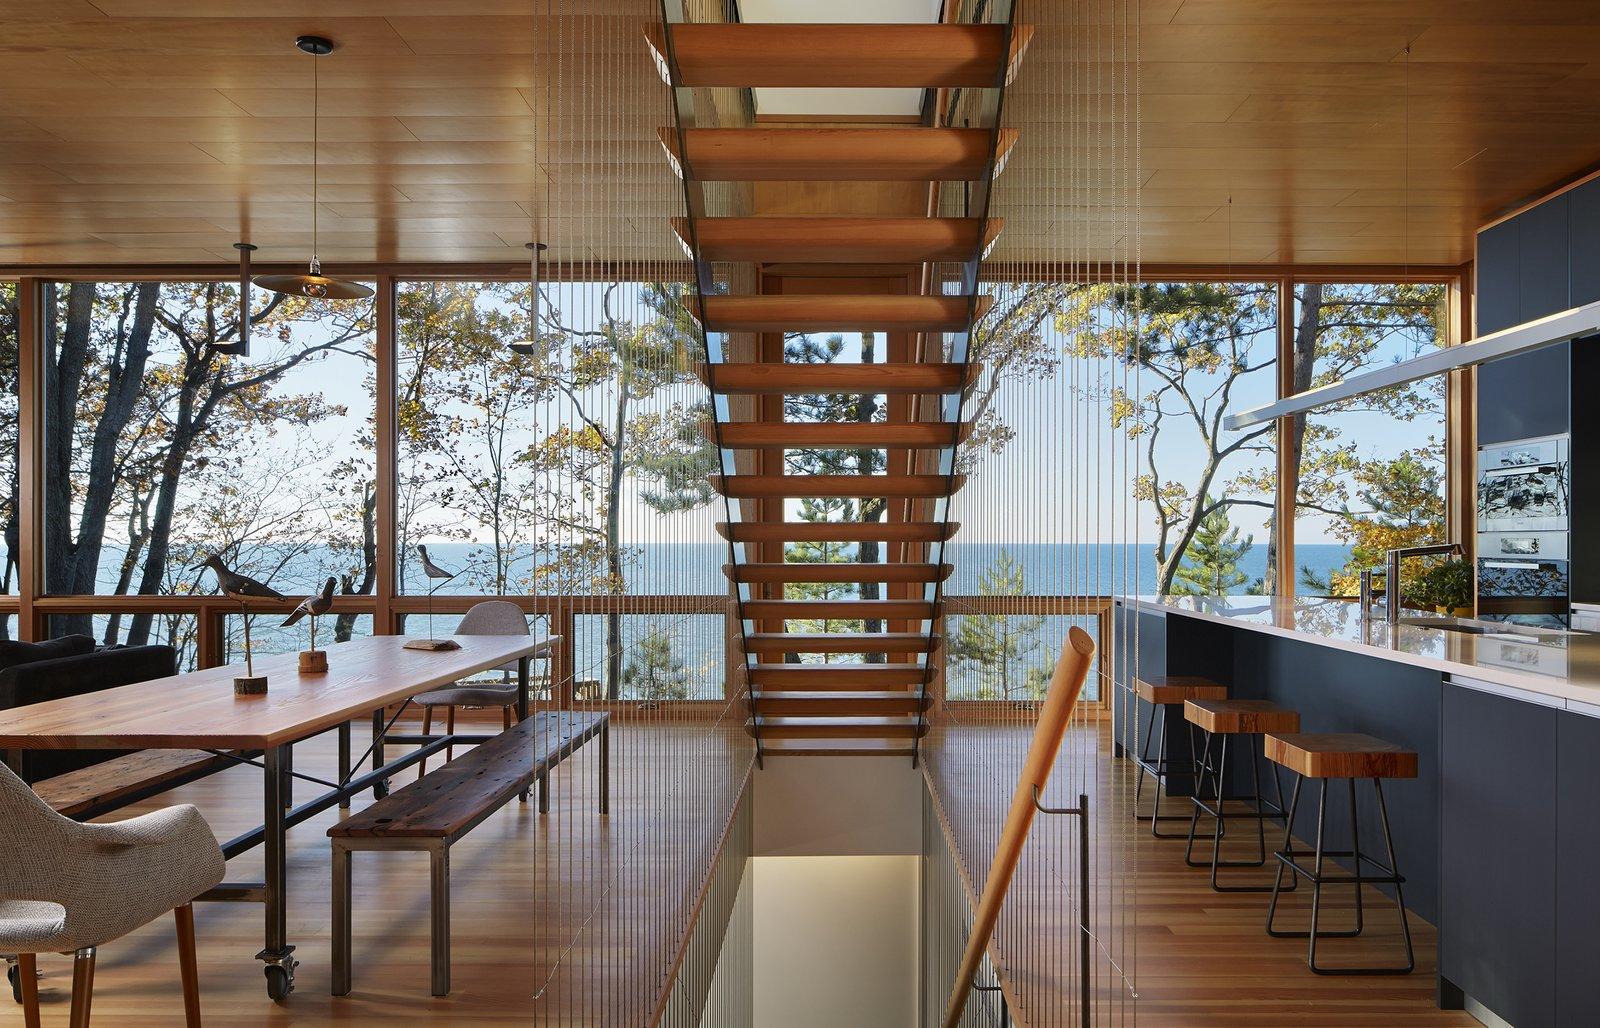 Suns End Retreat dining area